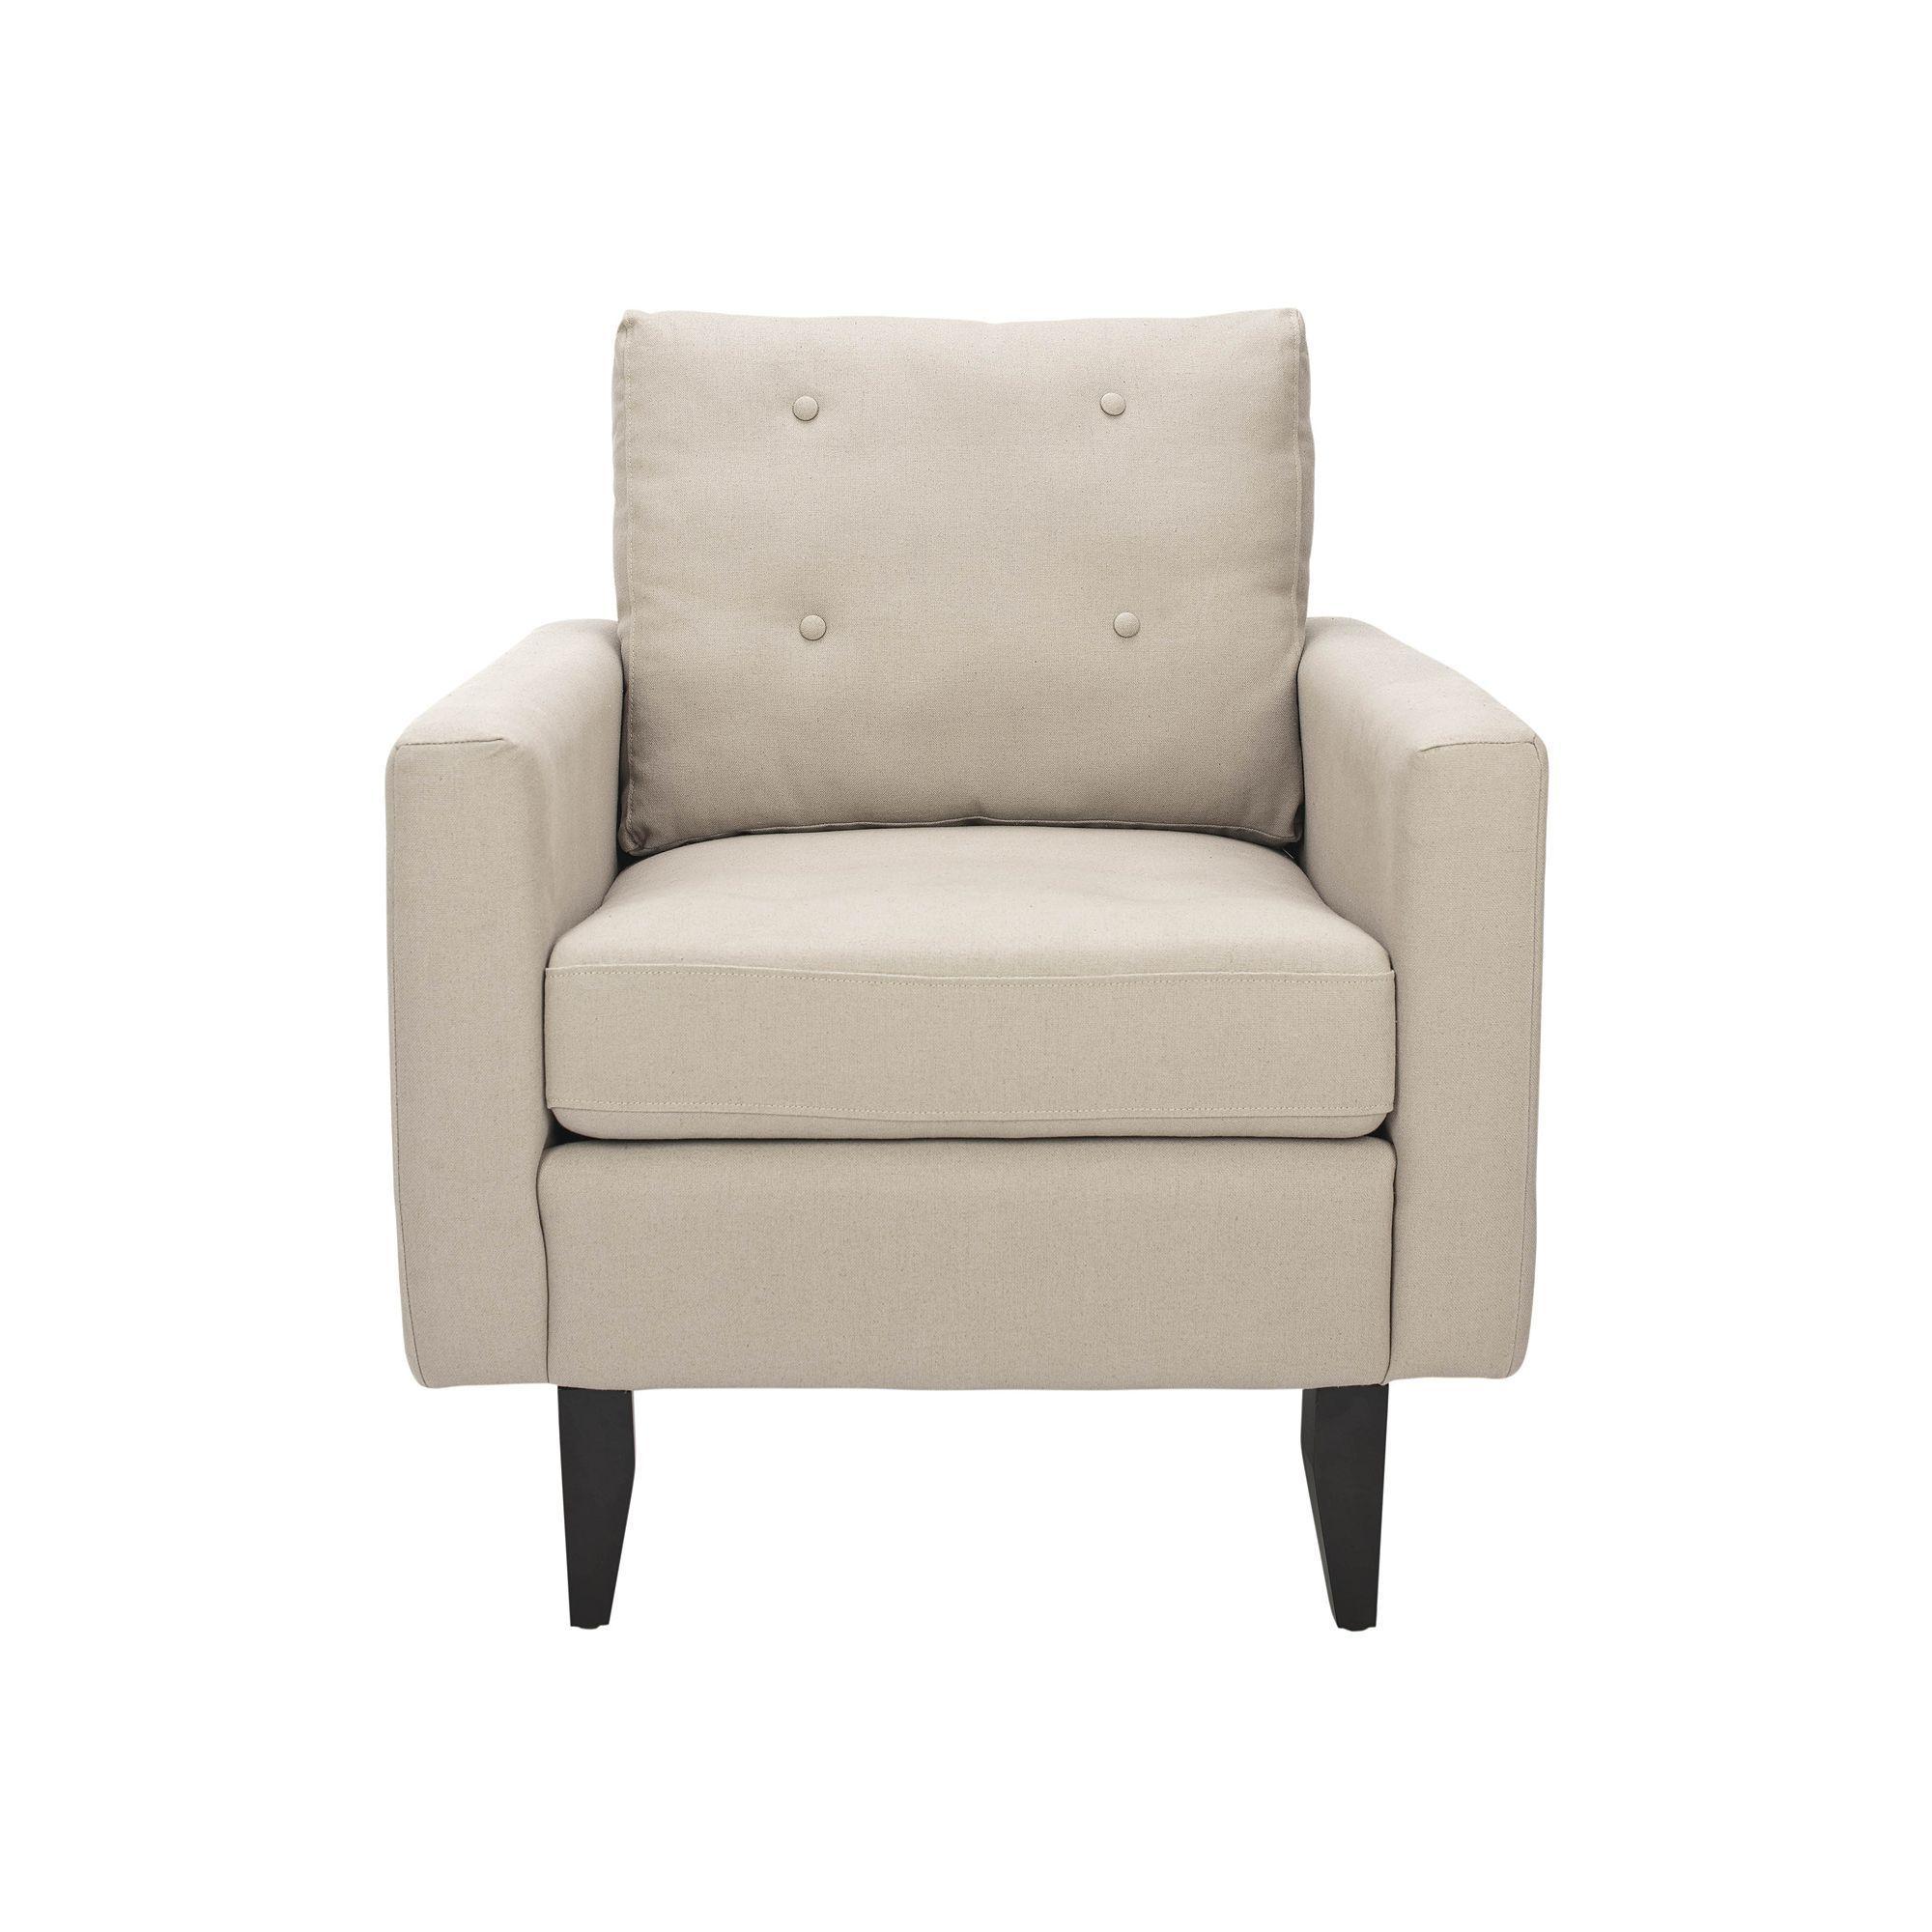 Enjoyable Safavieh Caleb Club Chair Products Club Chairs Armchair Pdpeps Interior Chair Design Pdpepsorg